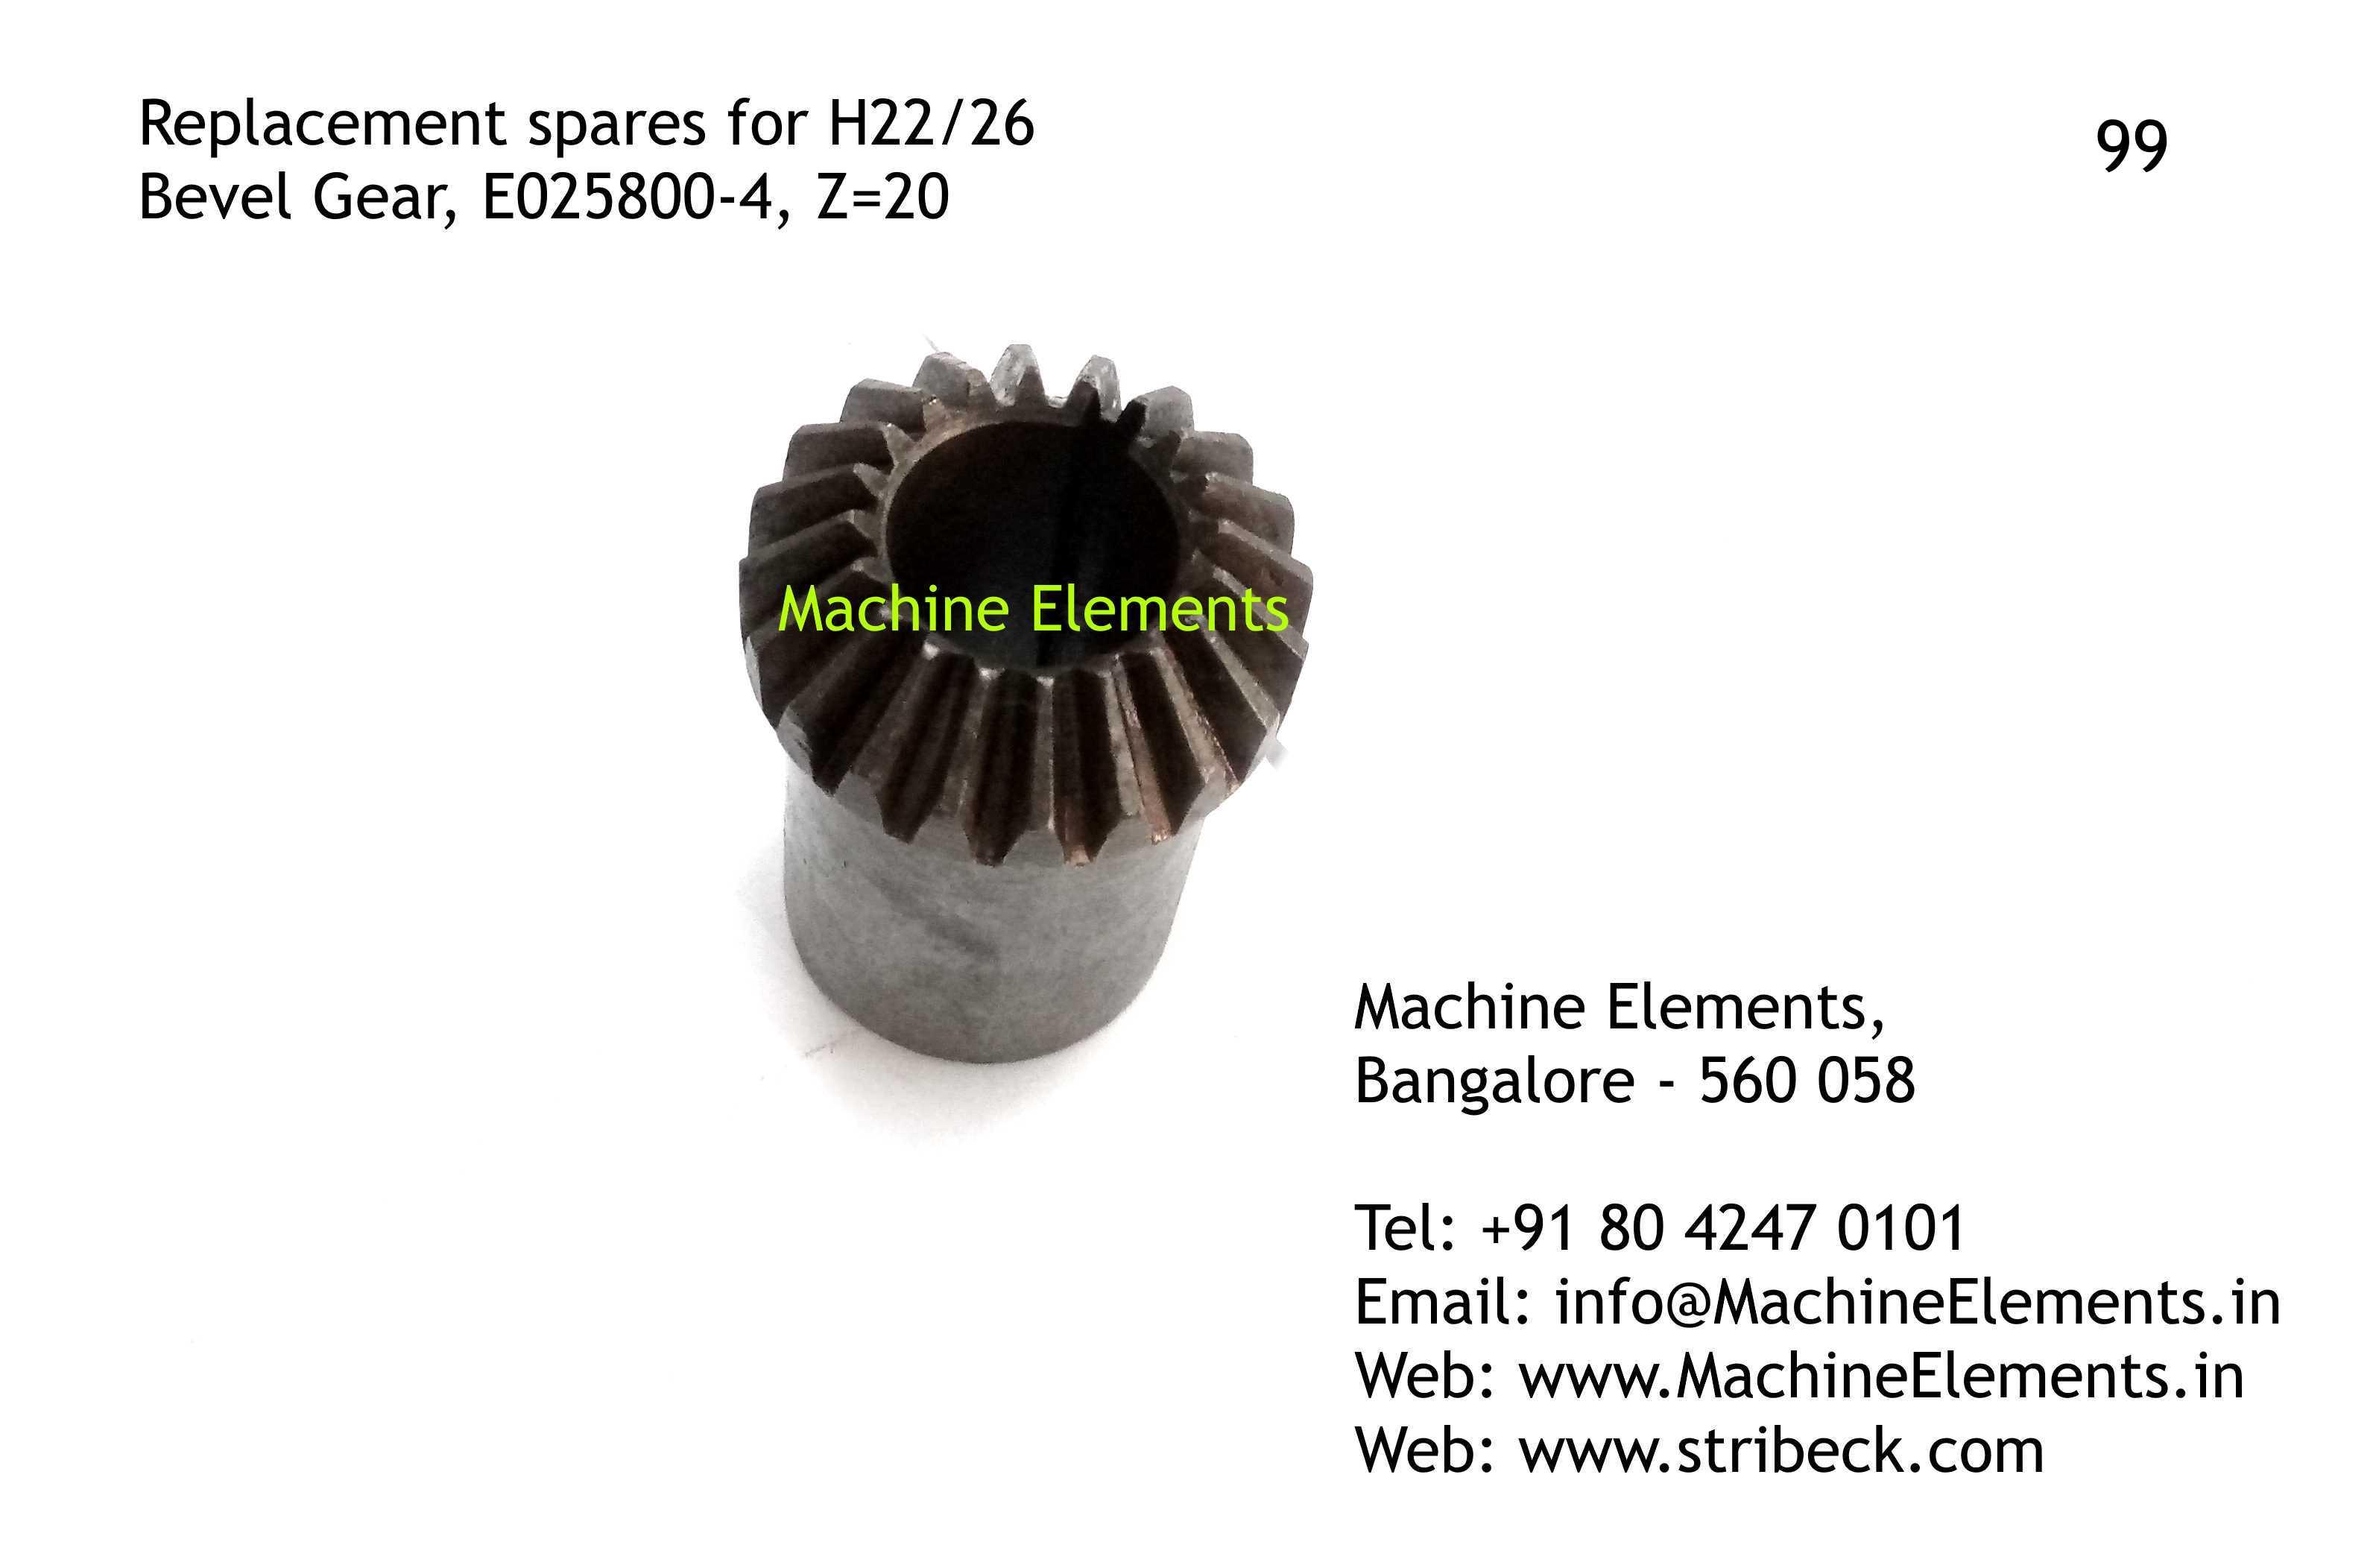 Bevel Gear, E025800-4, Z=20